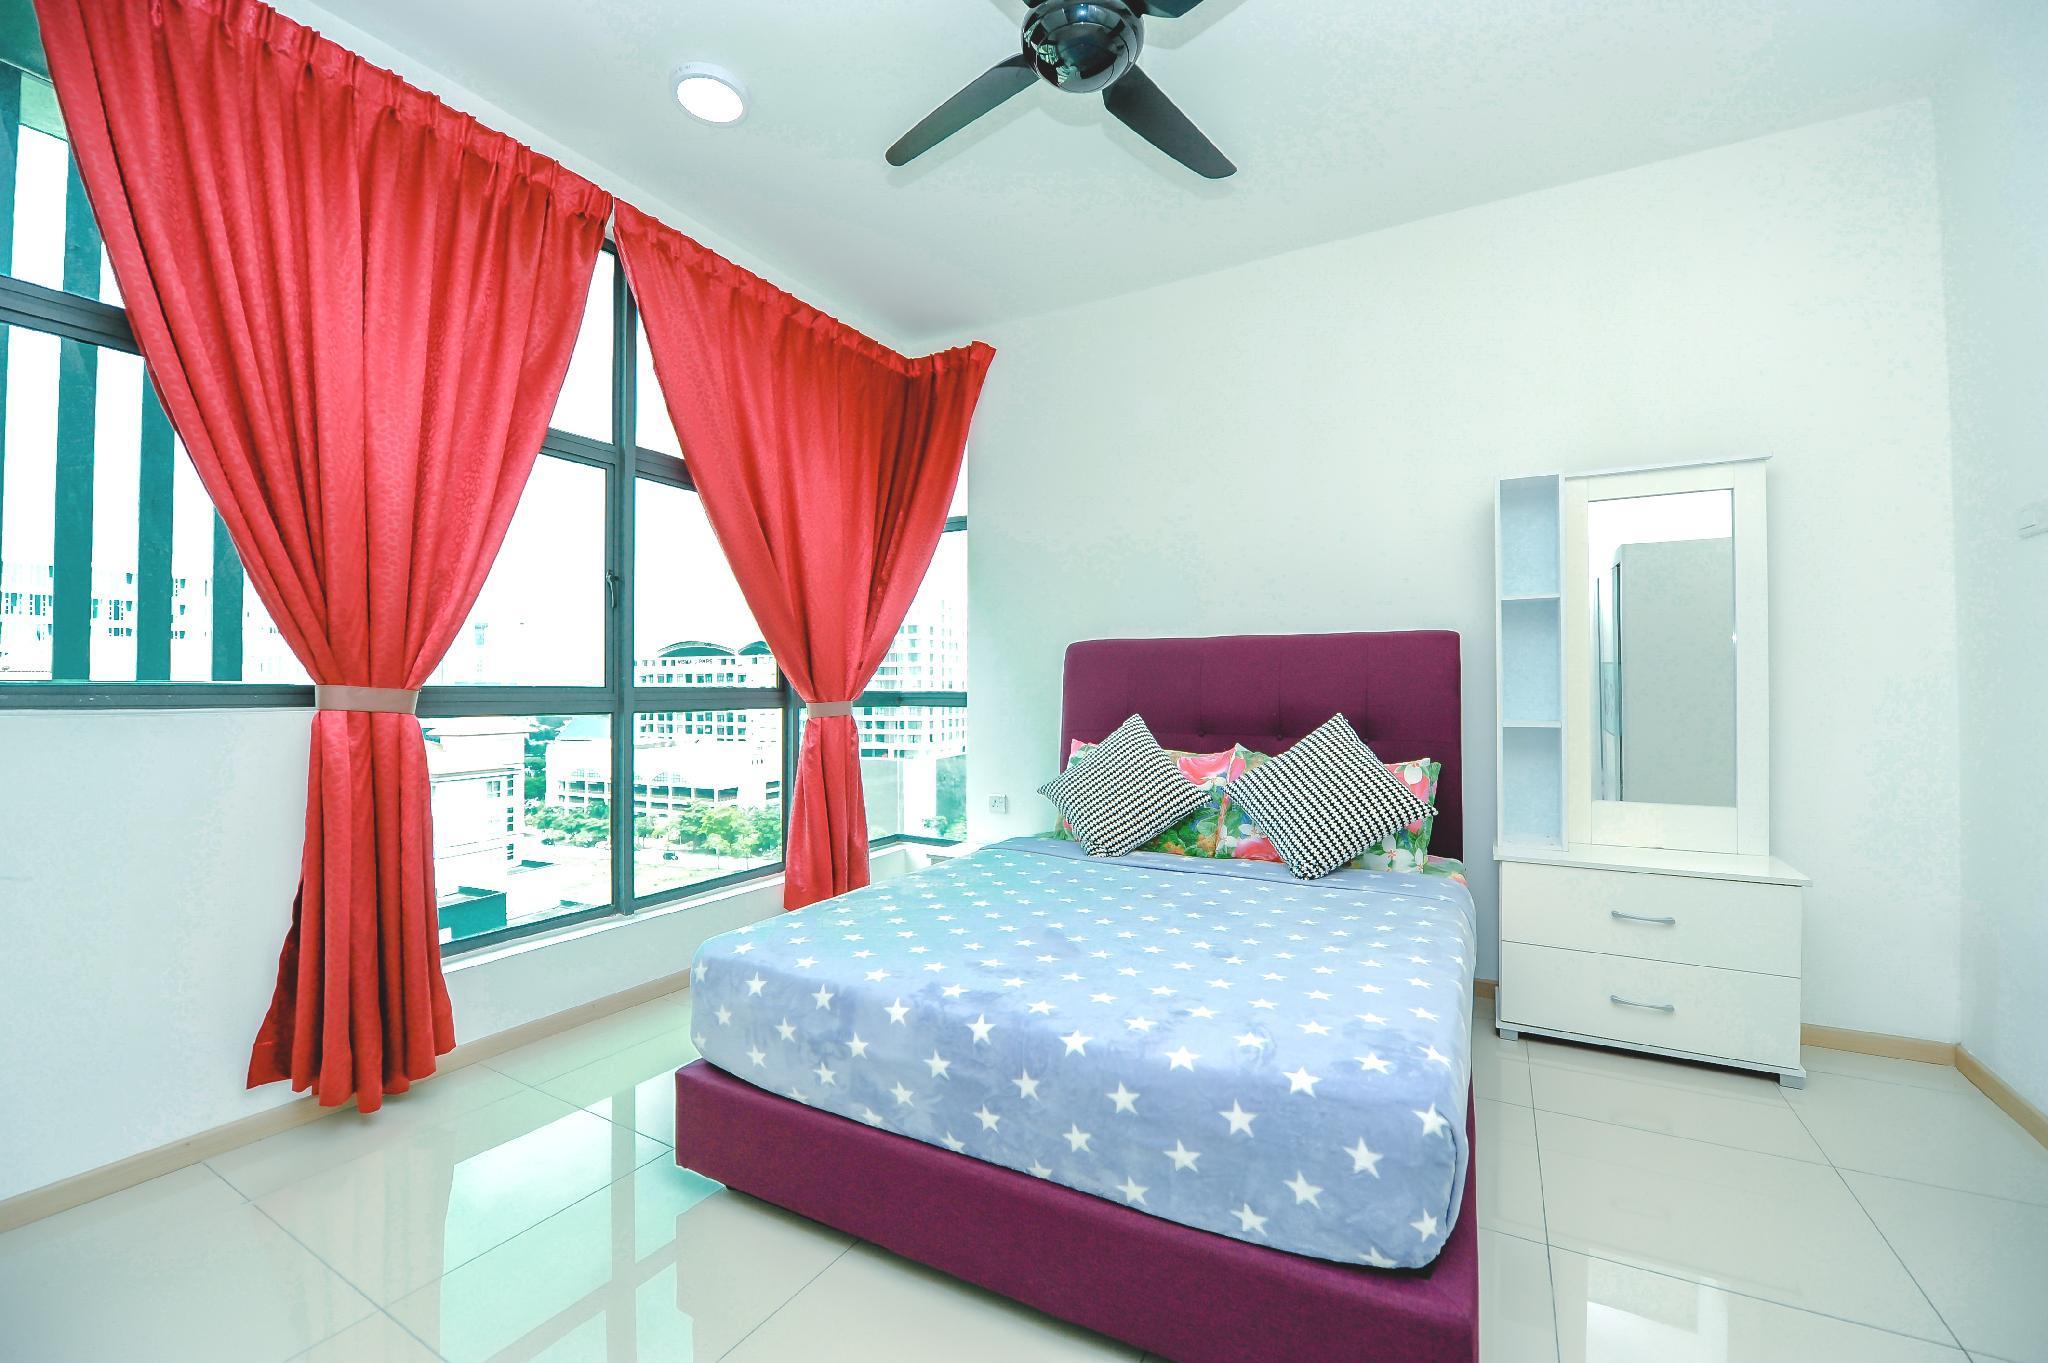 Shah Suites (Vista Alam Apartment Homestays), Kuala Lumpur